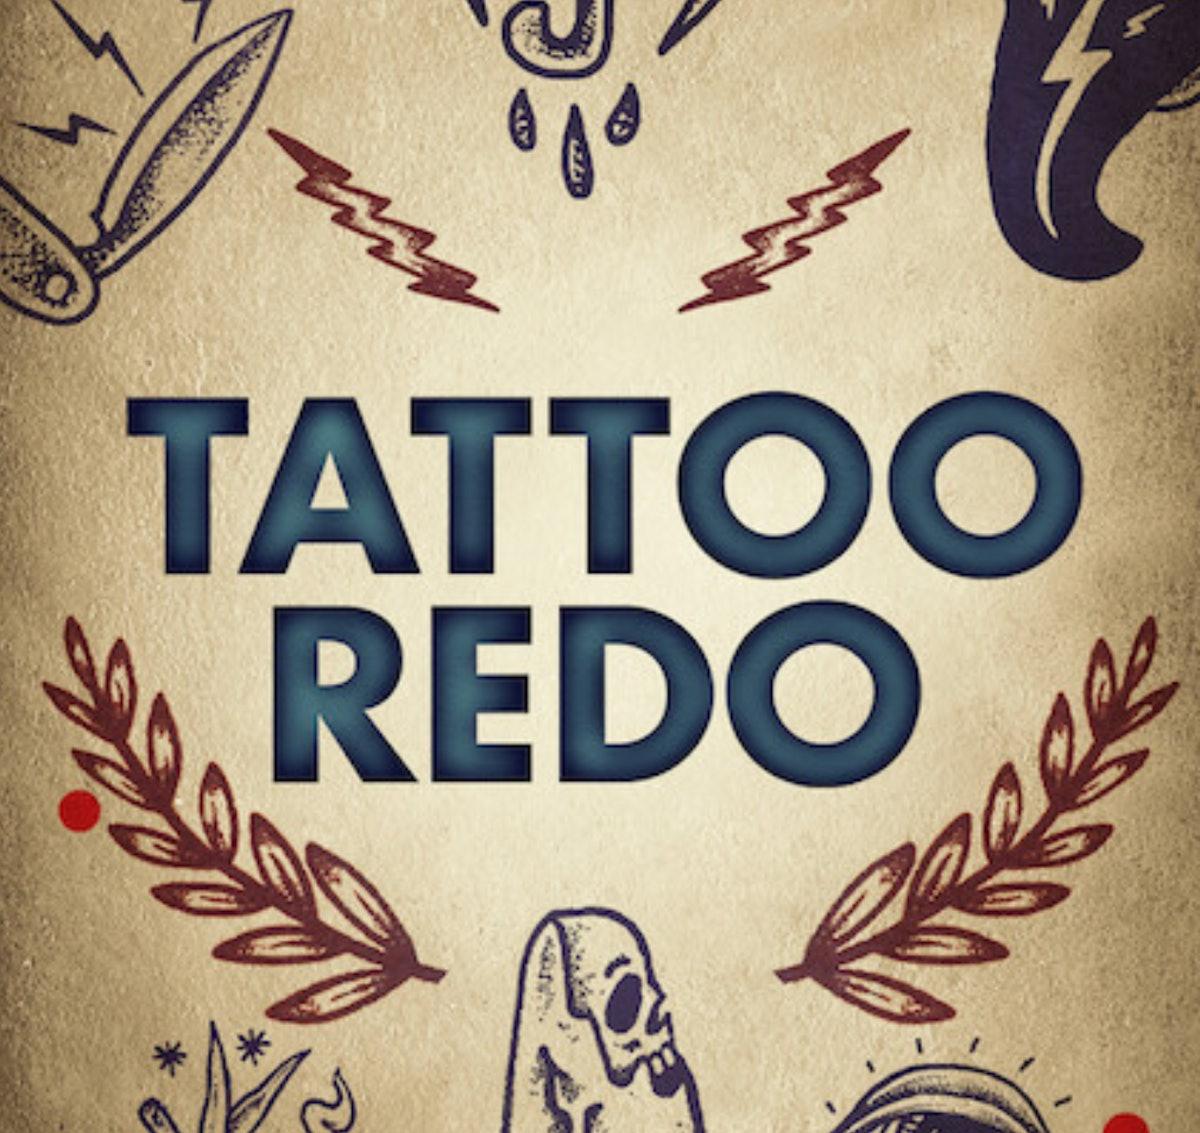 The Tattoo Redo poster